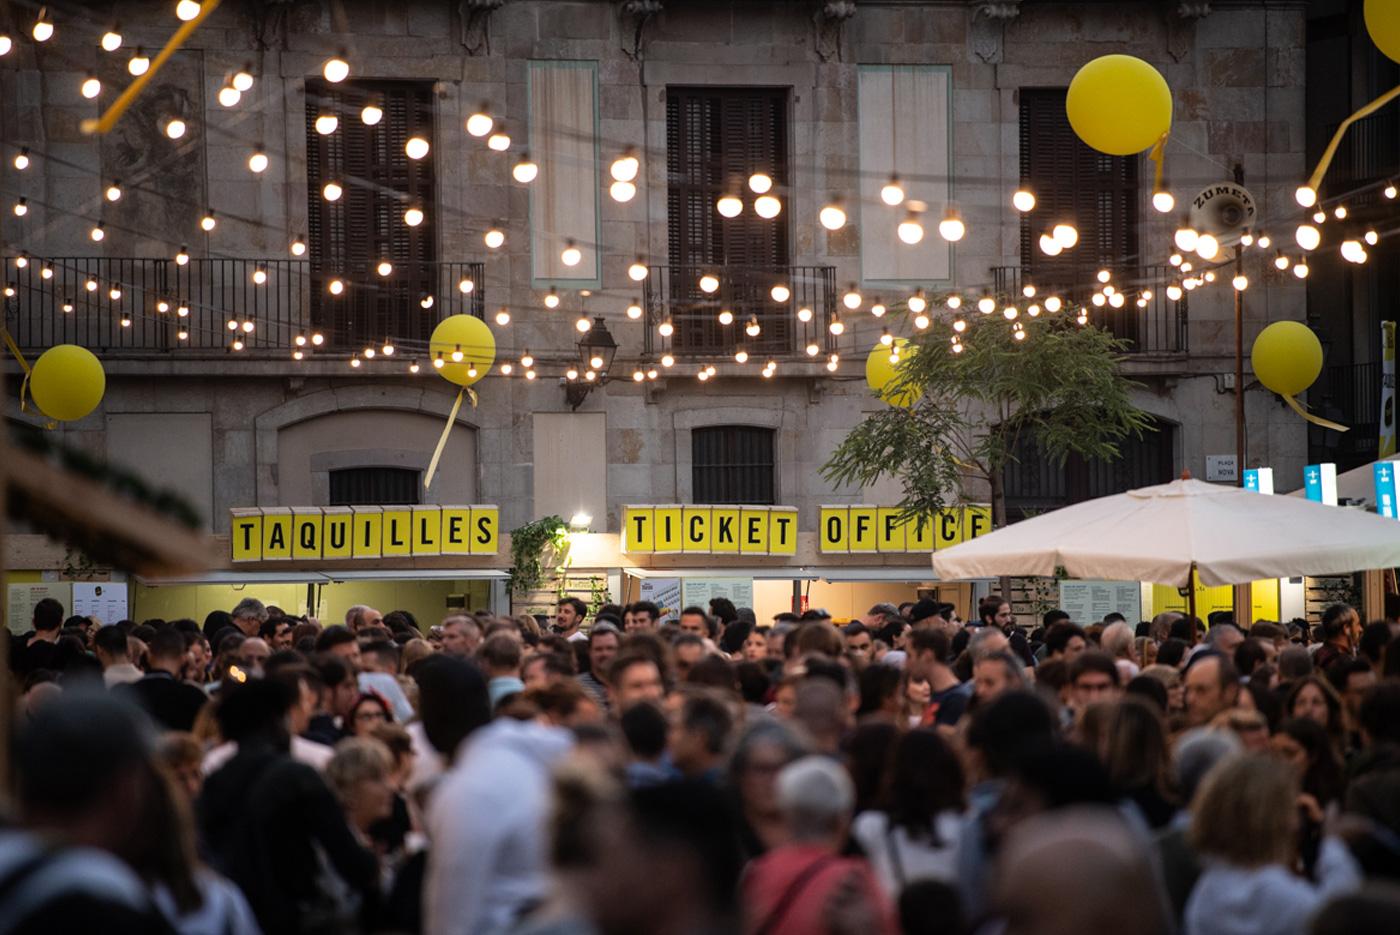 disseny mercat de mercats barcelona